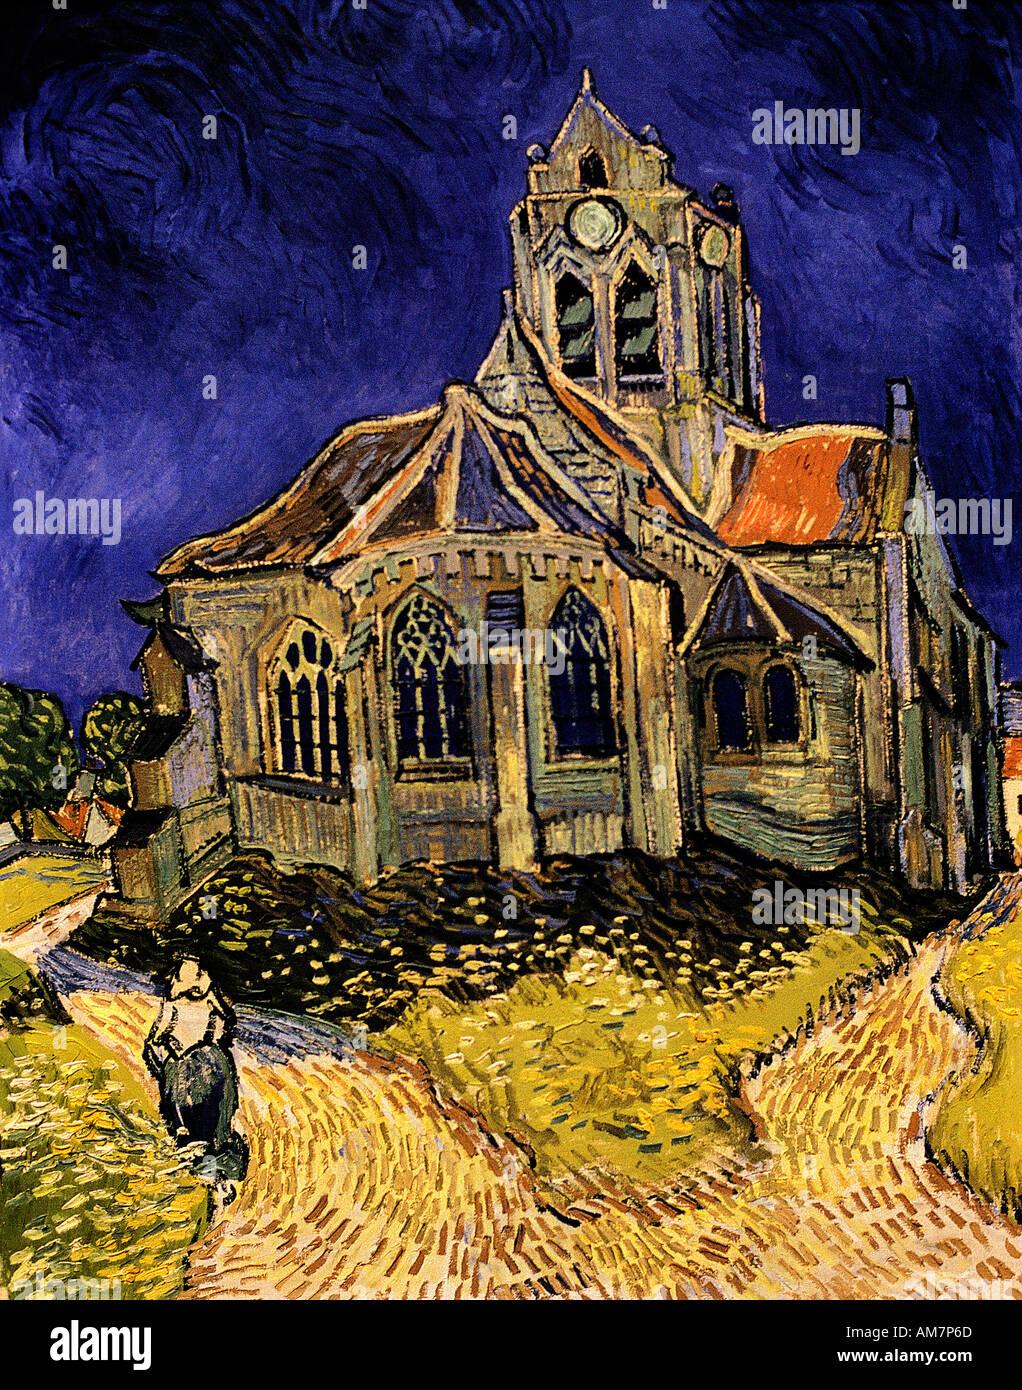 church at auvers sur oise view of the apse by vincent van. Black Bedroom Furniture Sets. Home Design Ideas